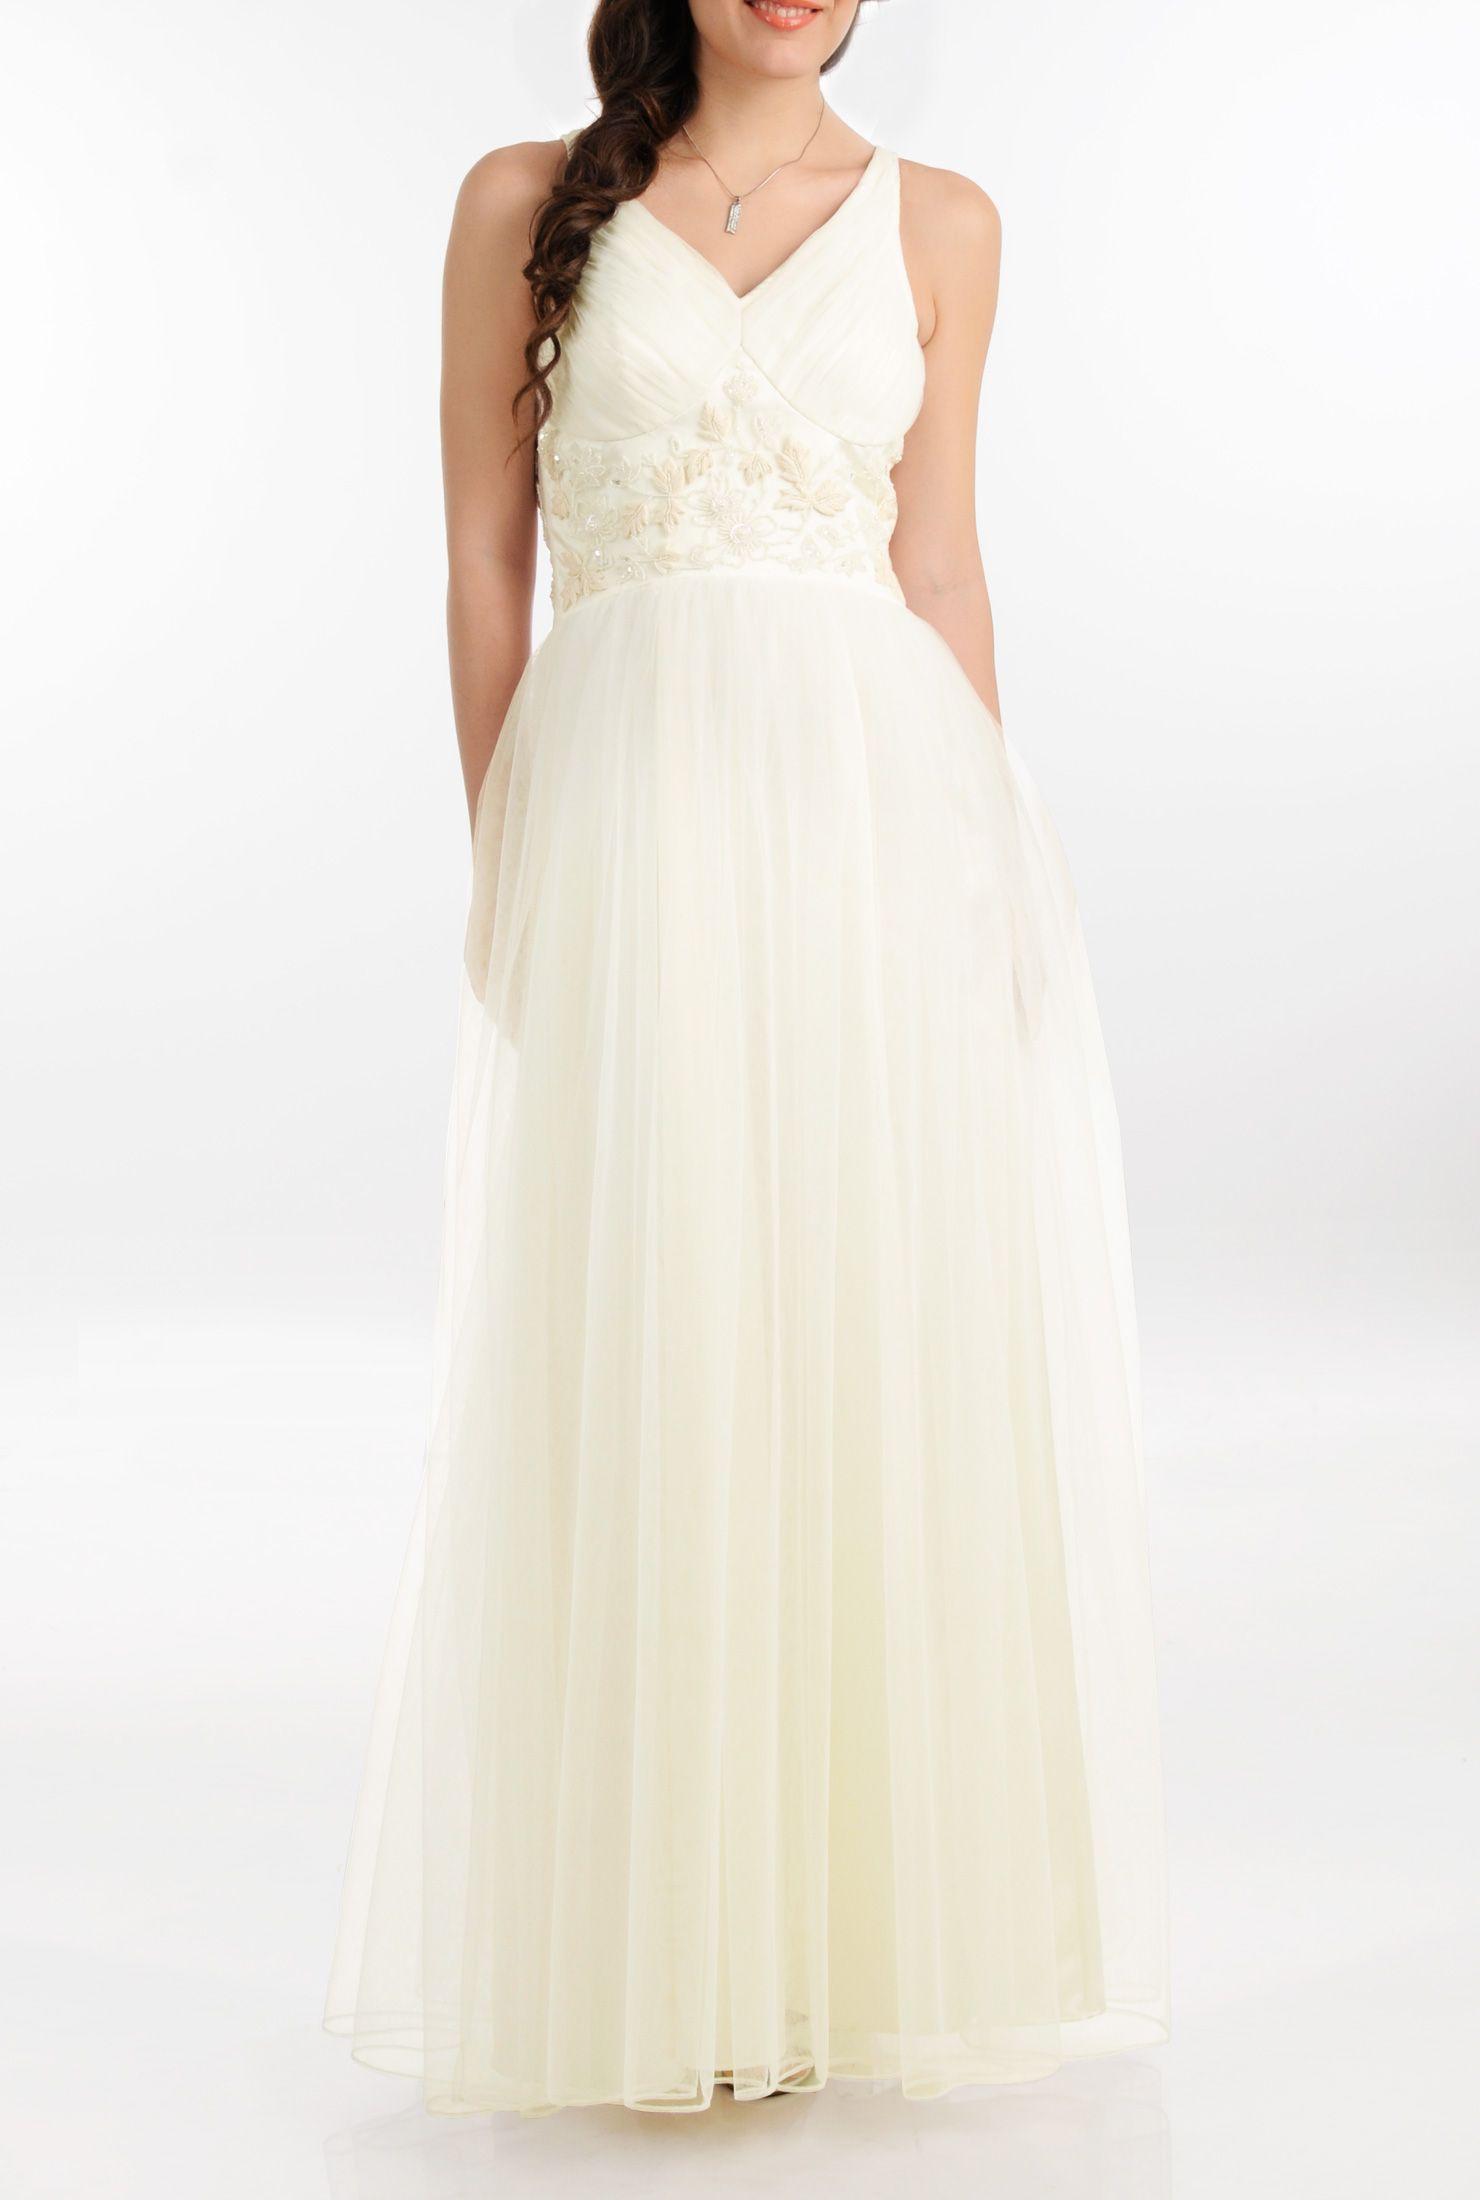 Lightweight wedding dresses  beaded gowns bridal dresses Dry clean dresses embellished dresses